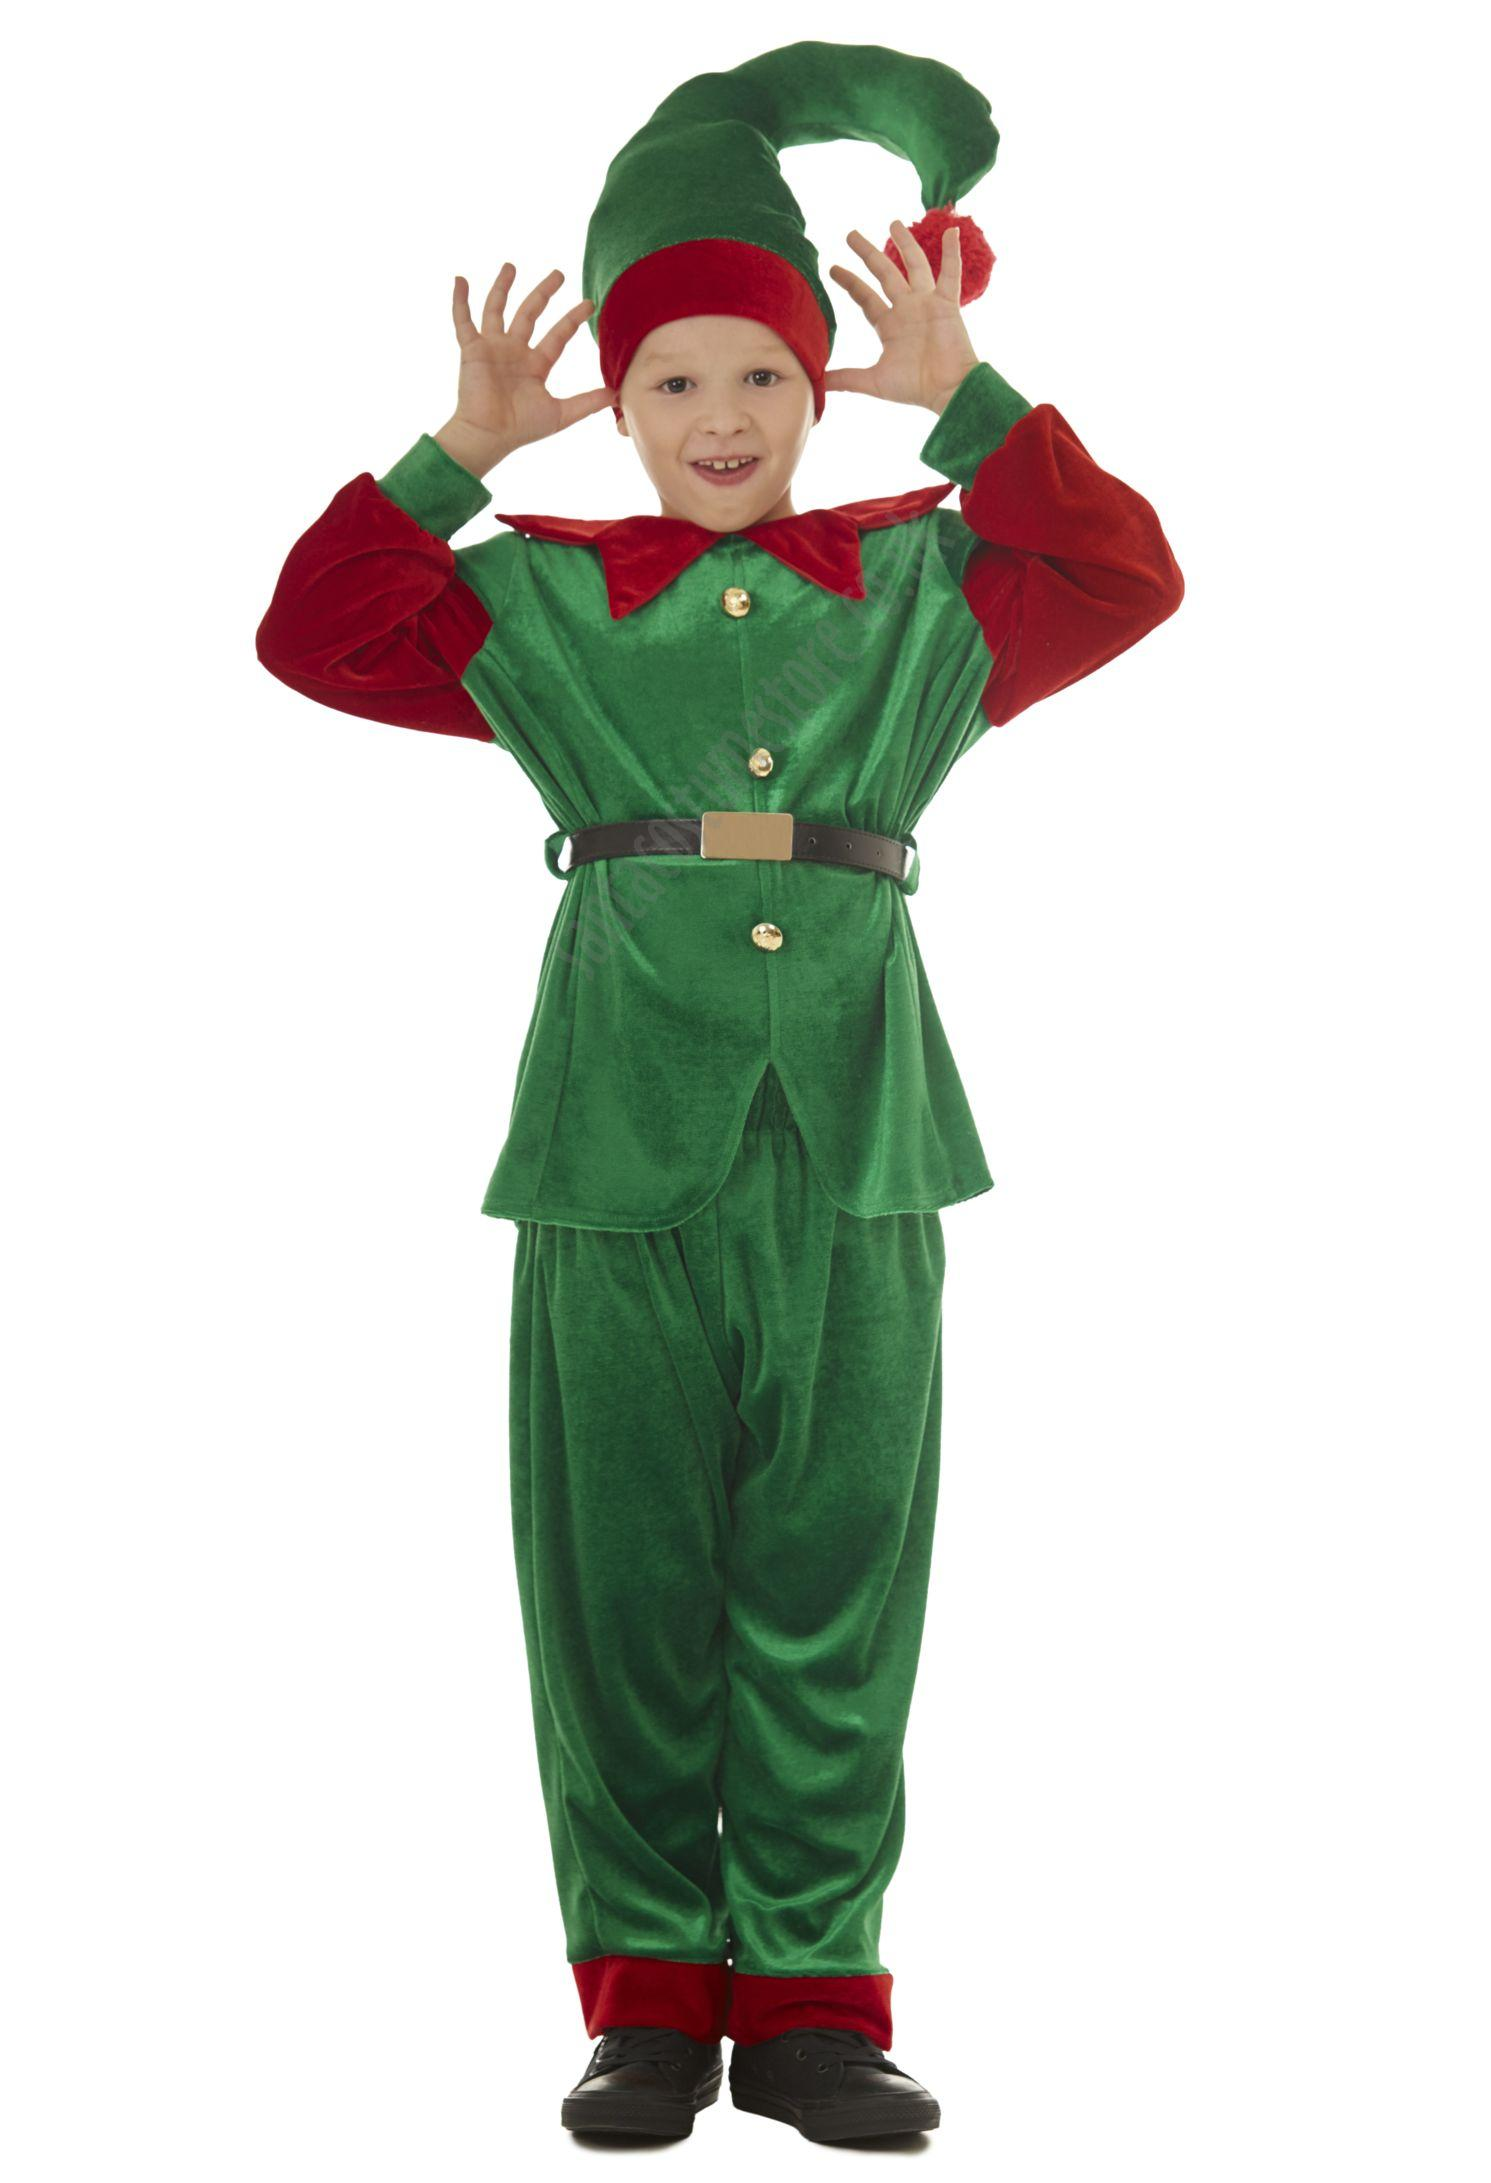 velour elf costume - children green elf suit for boys  sc 1 st  Santa Suits and Costumes & Boyu0027s elf costume - santacostumestore.co.uk